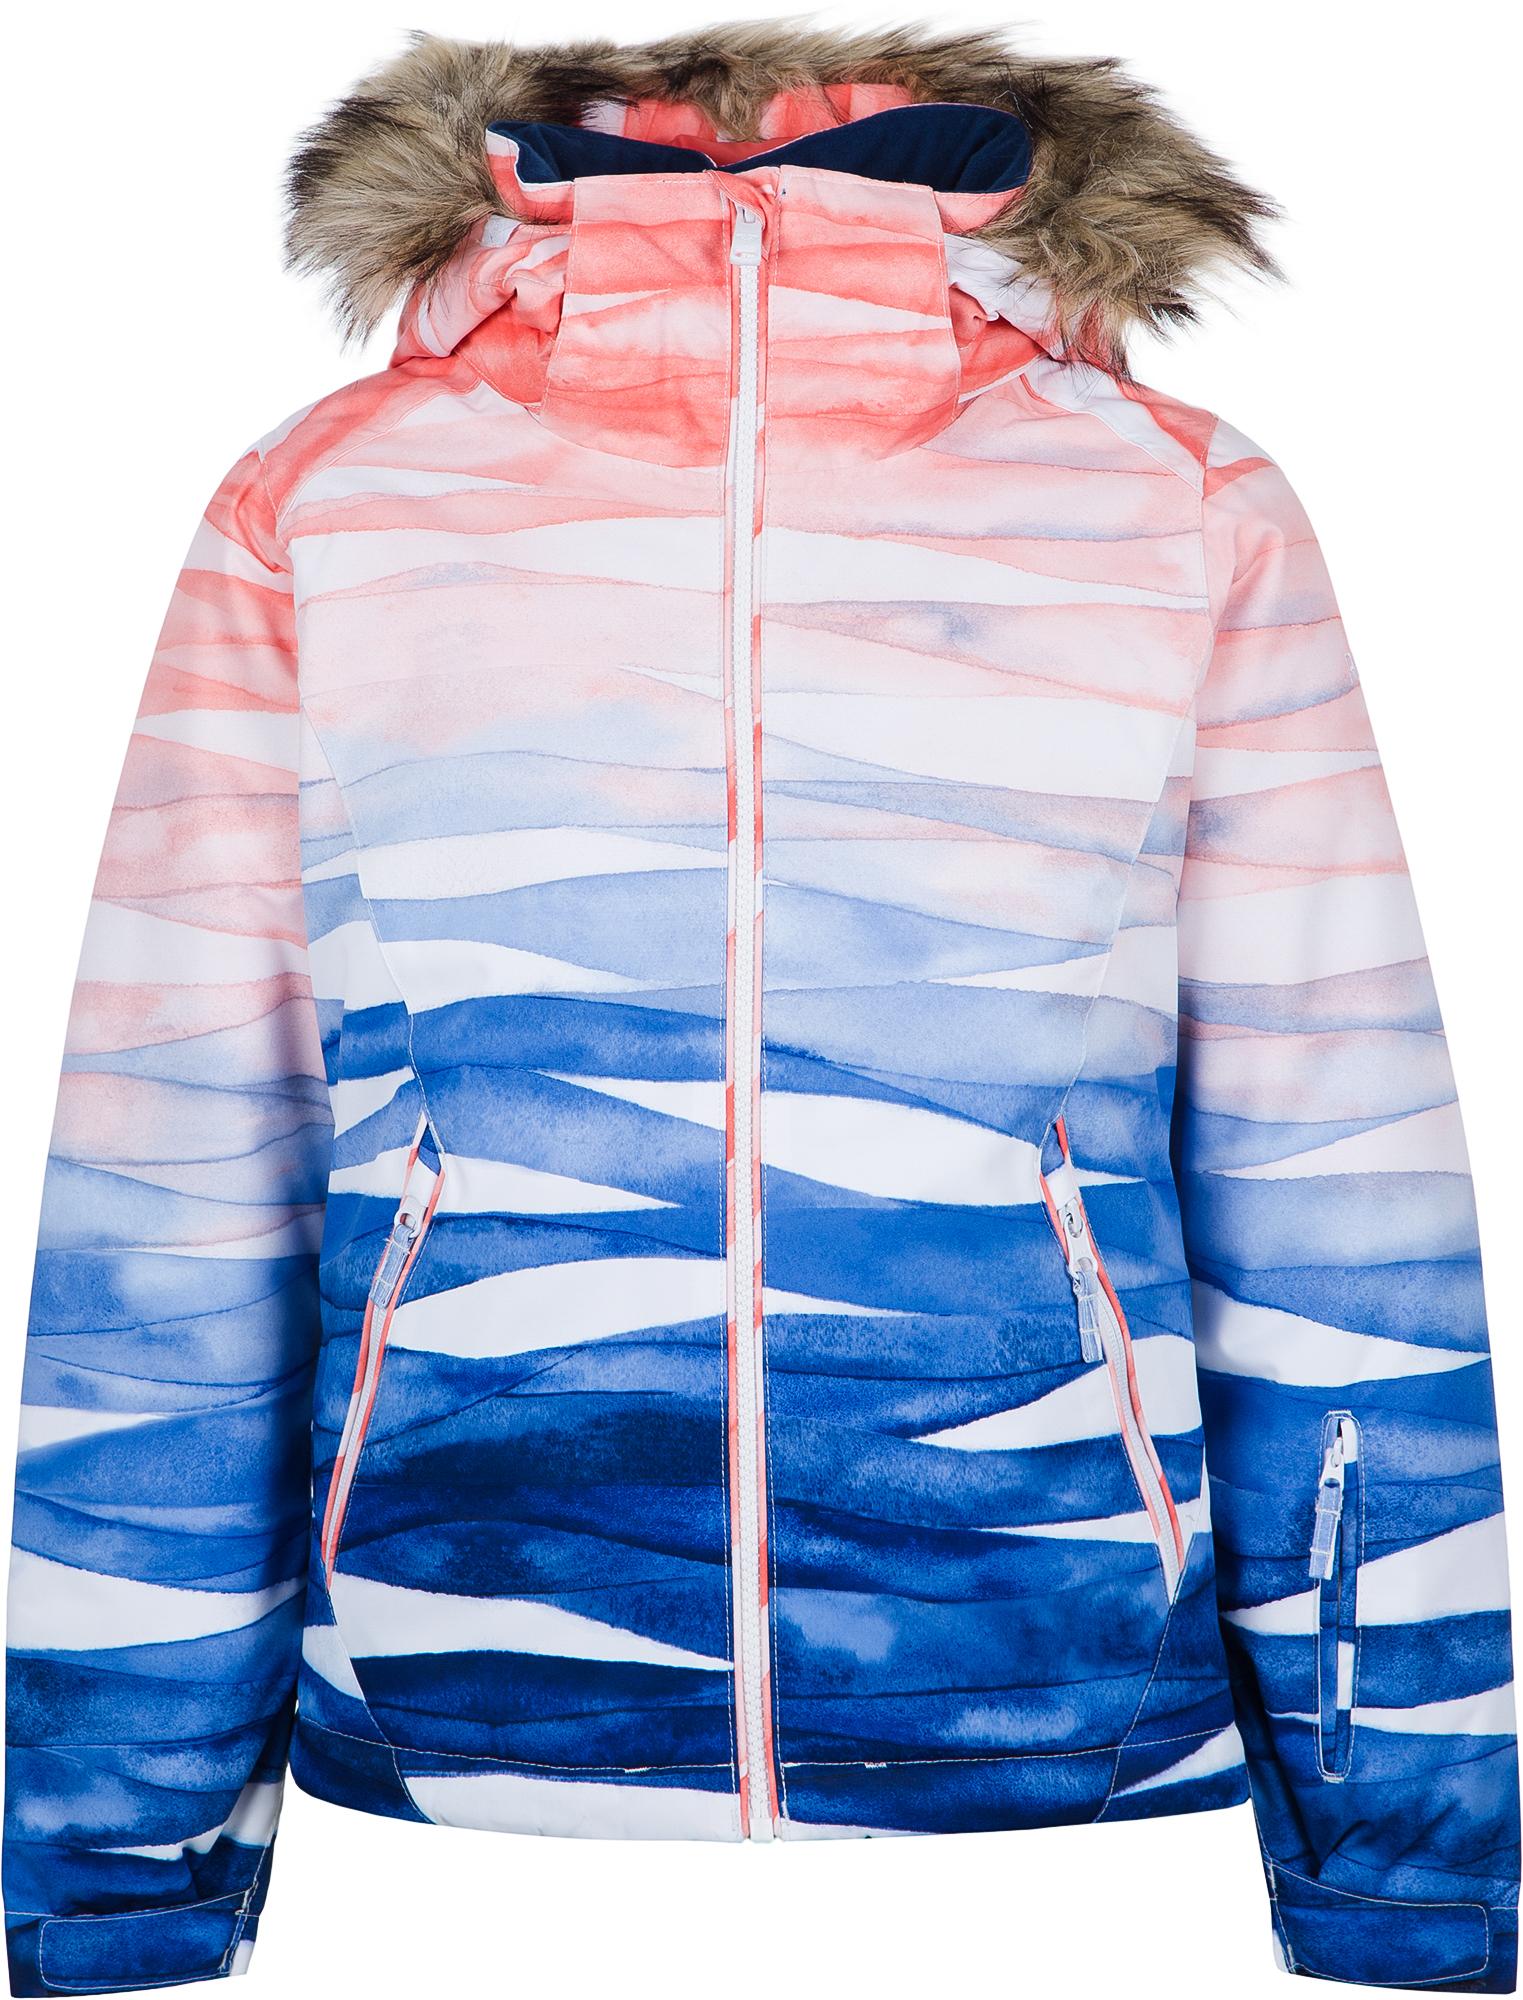 Roxy Куртка утепленная для девочек Jet Ski, размер 164-170